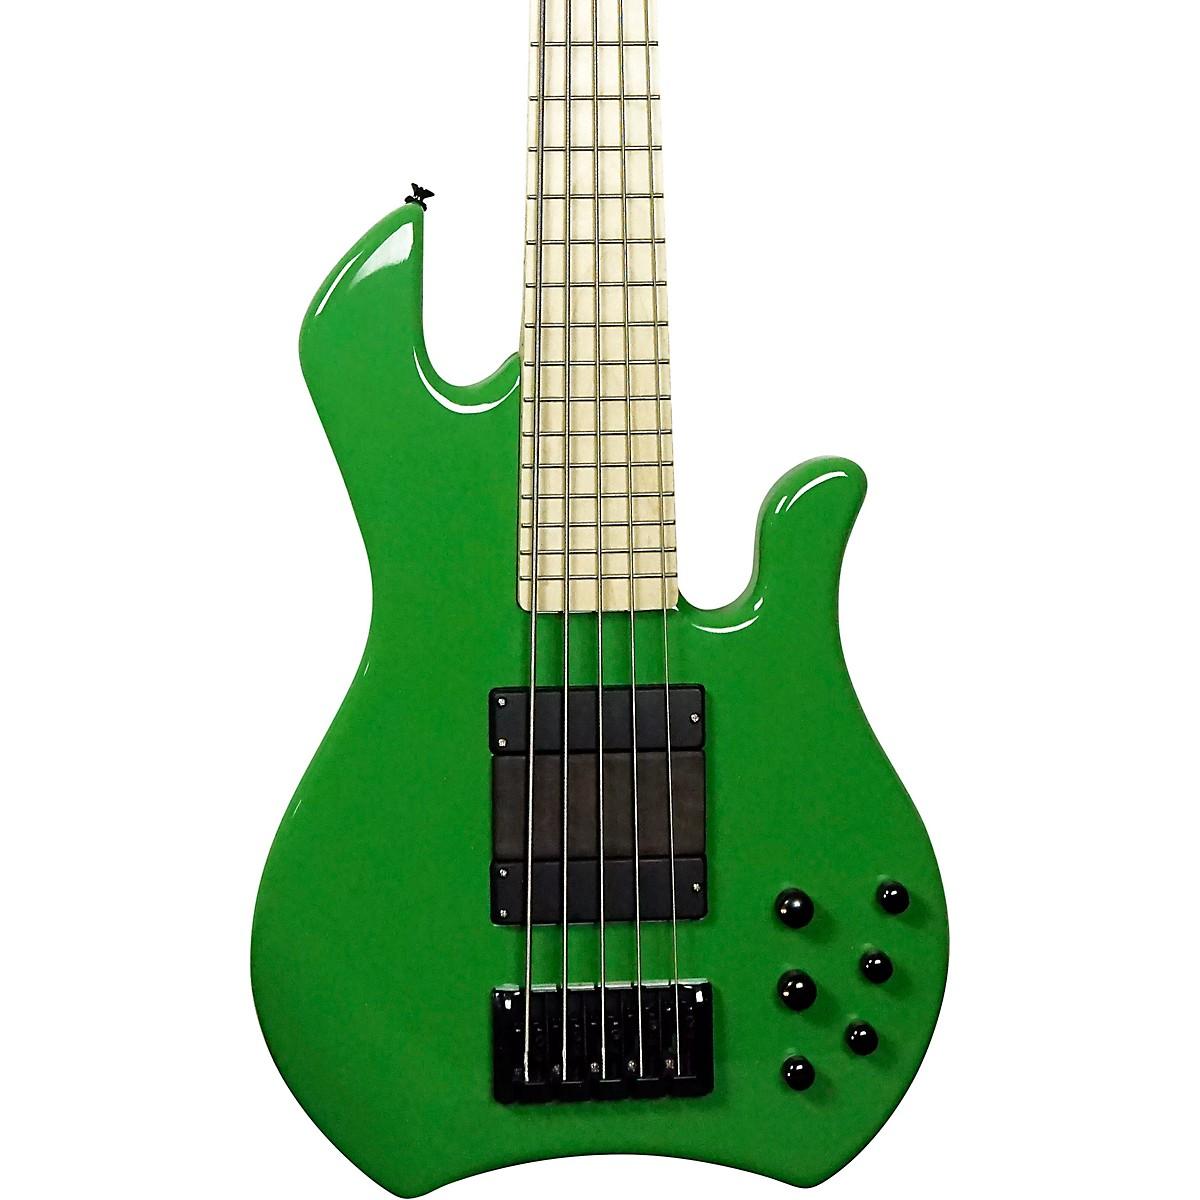 Markbass Kimandu 5 Richard Bona Signature 5-String Bass